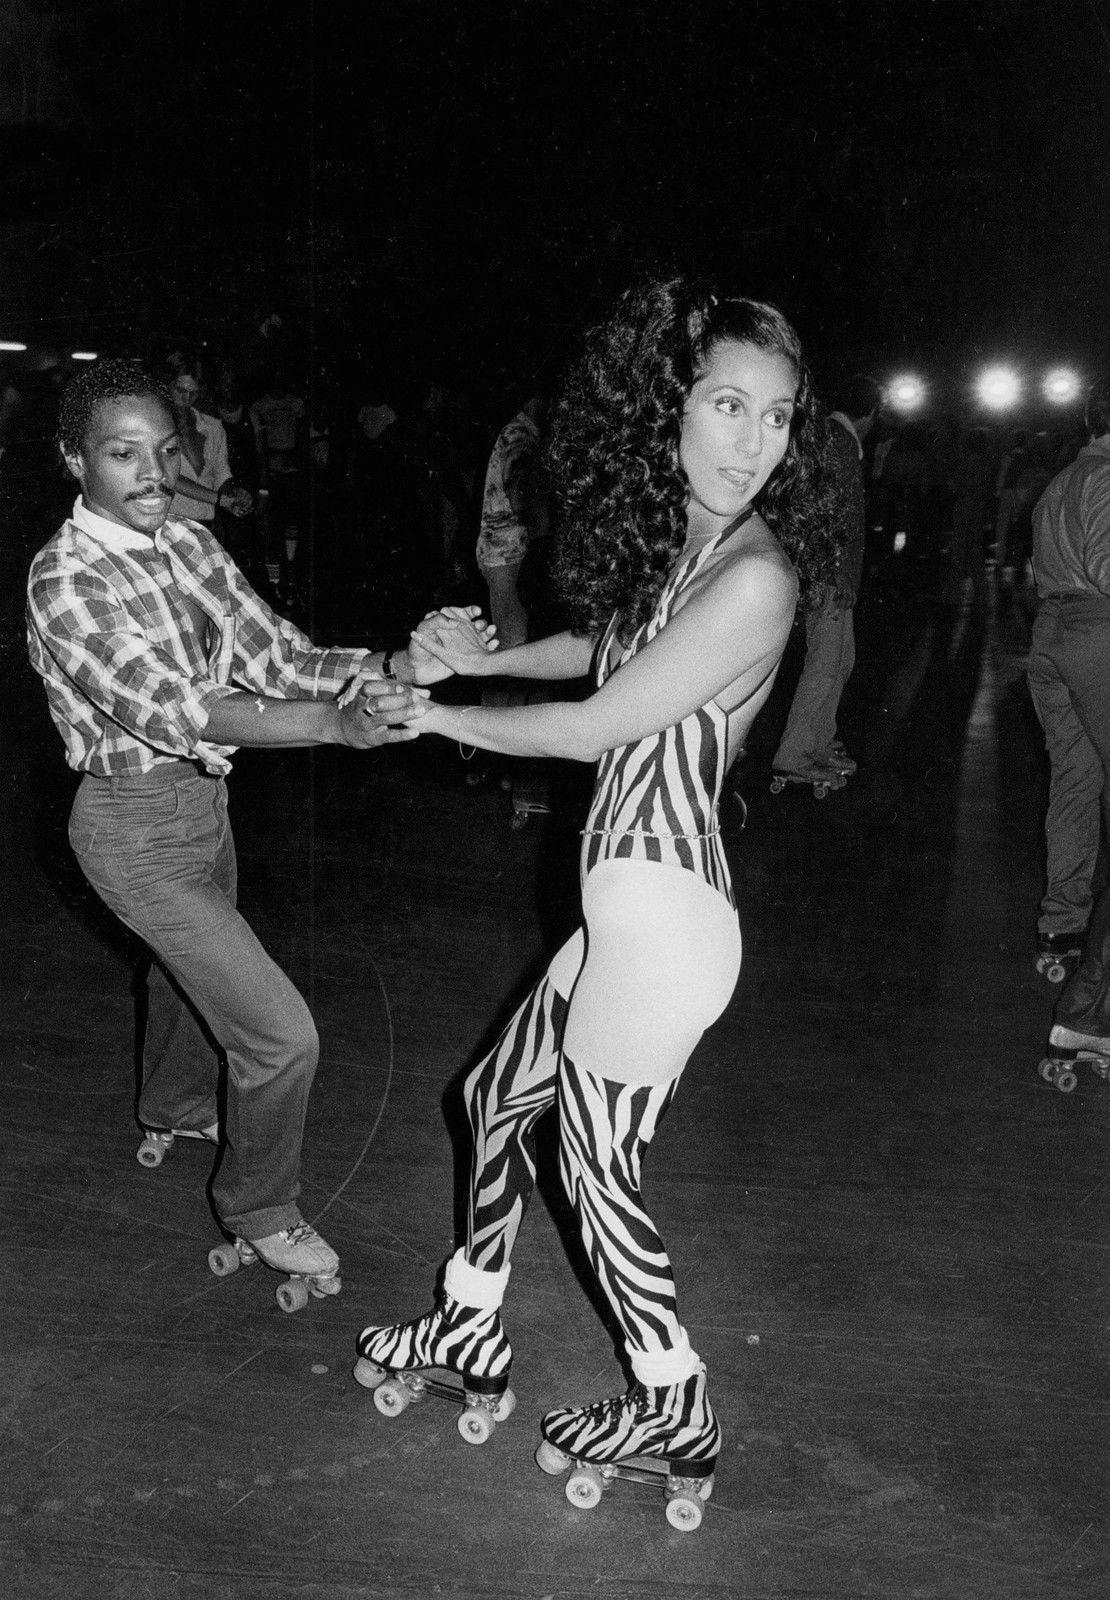 Cher Skate Disco Roller Skating Roller Girl Roller Skating Outfits